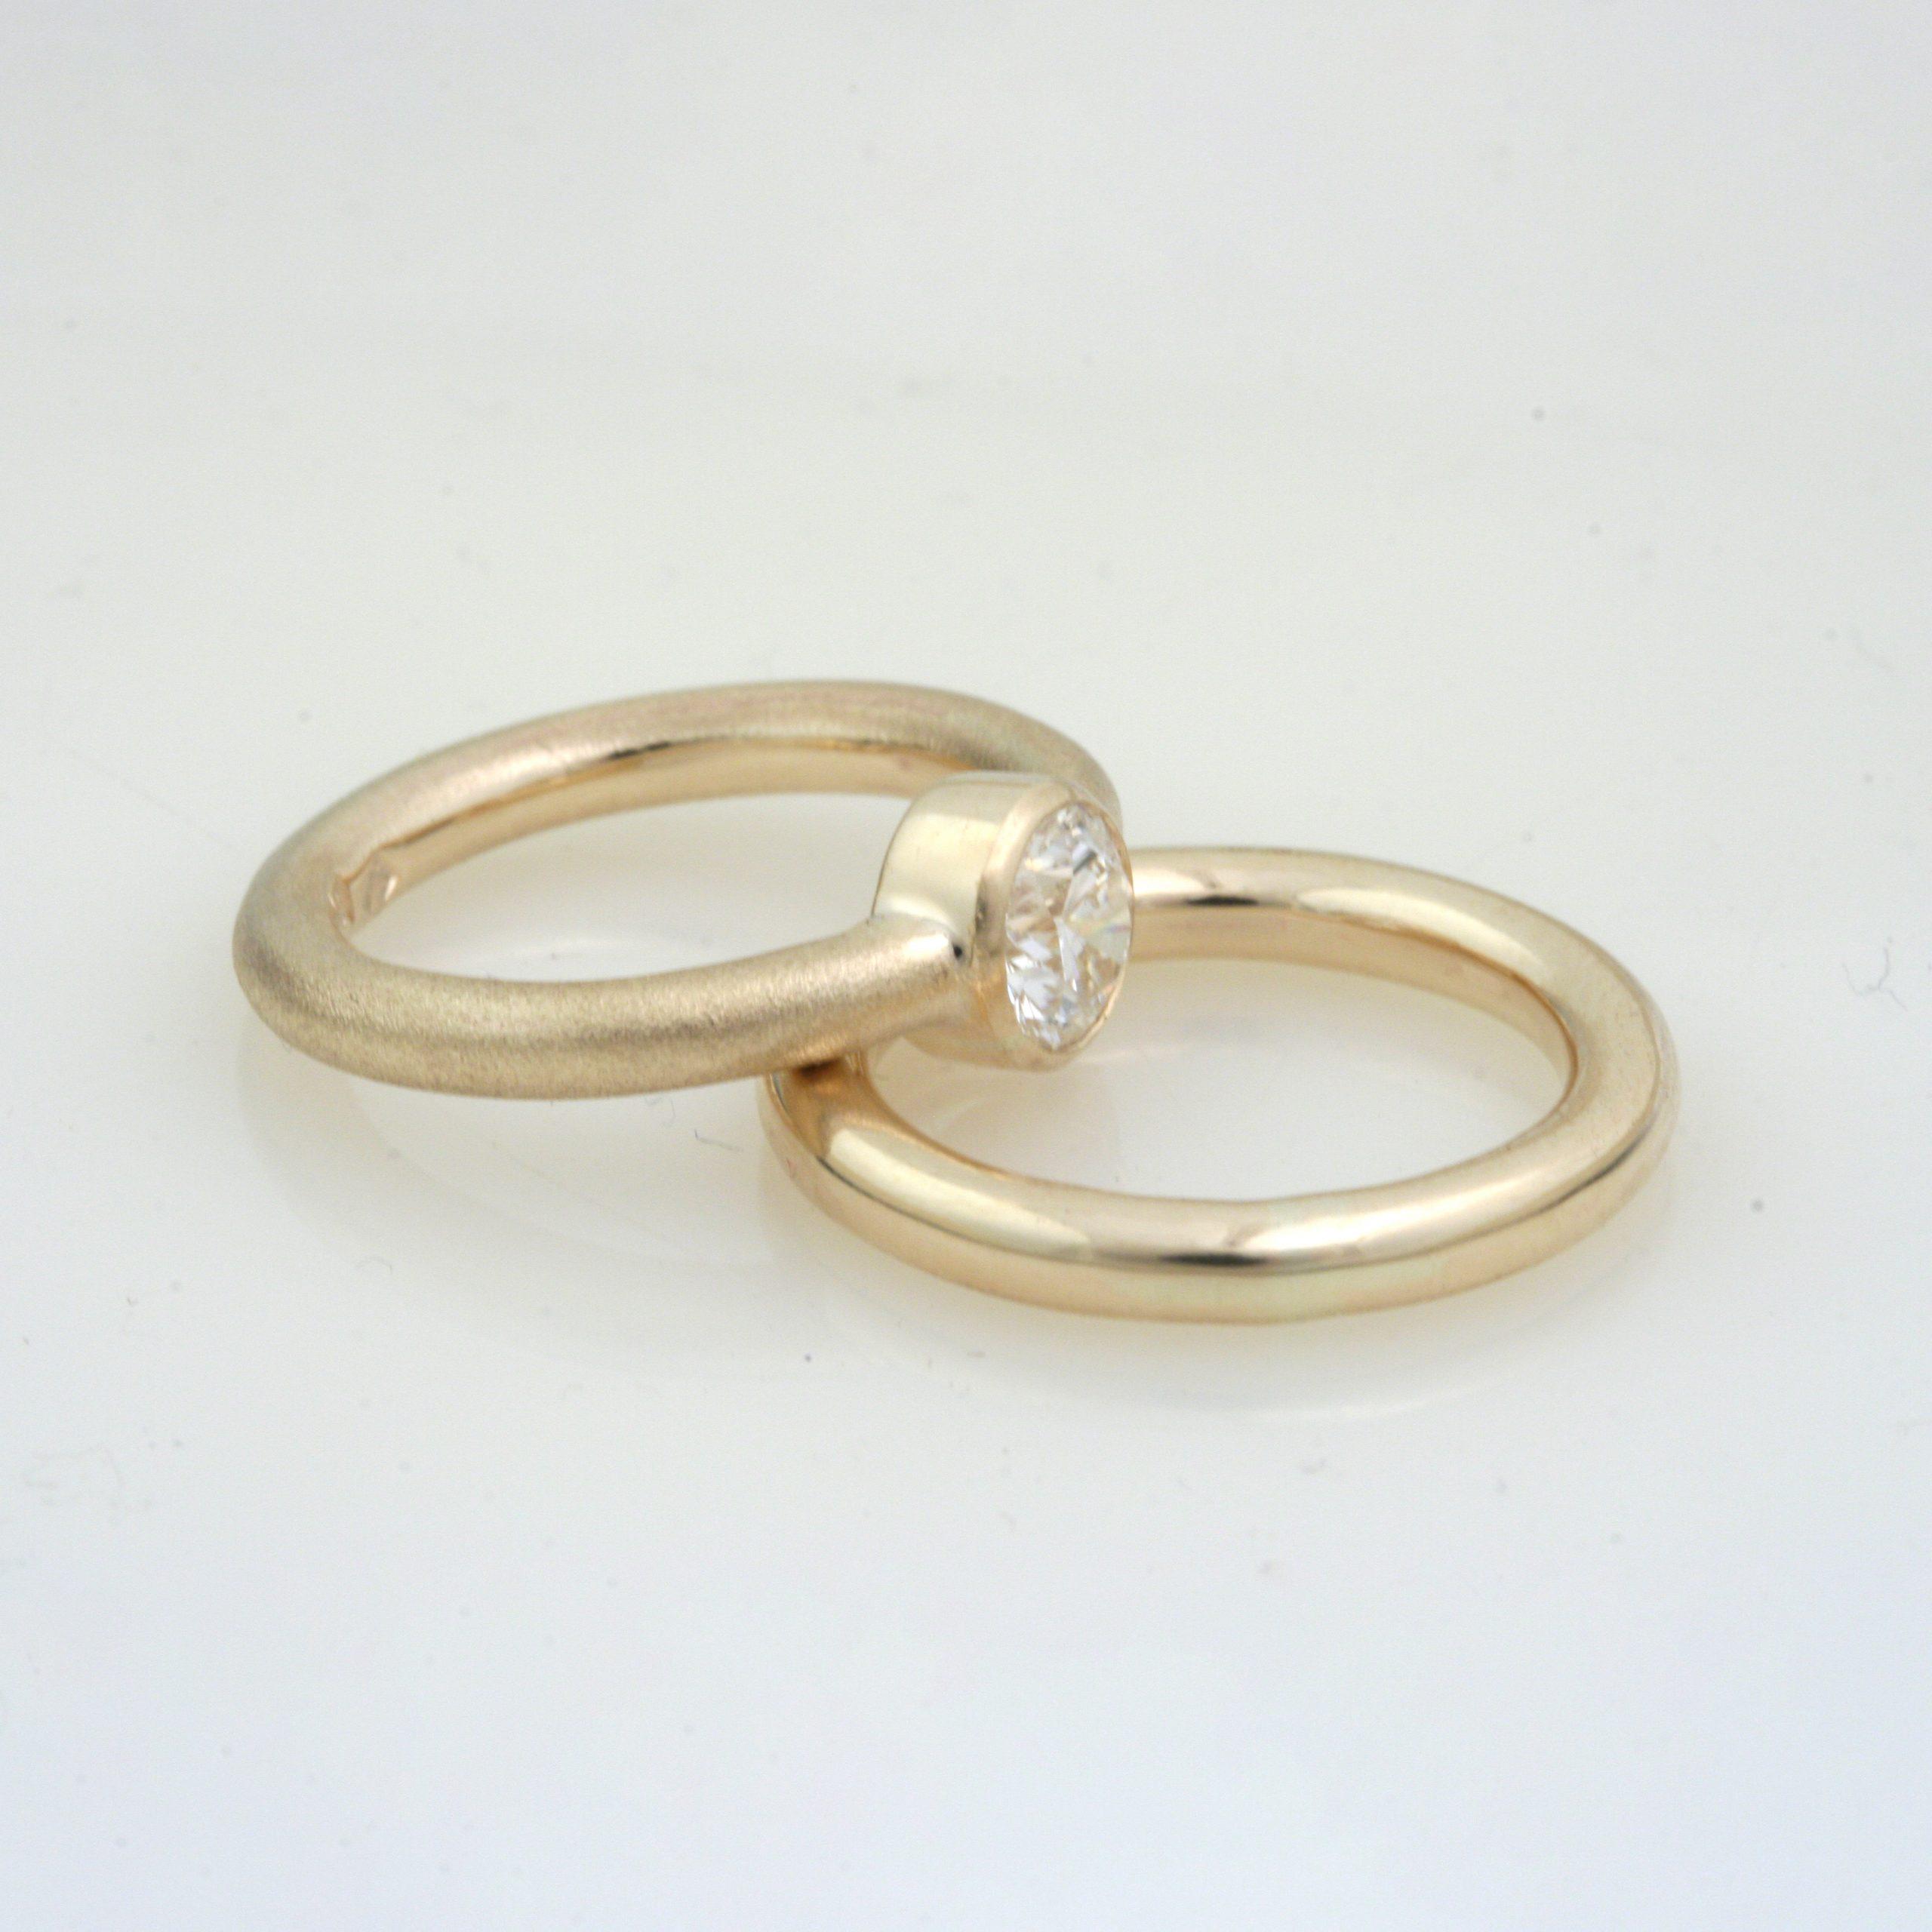 Impressive Gold Natural Texture Diamond Ring 6